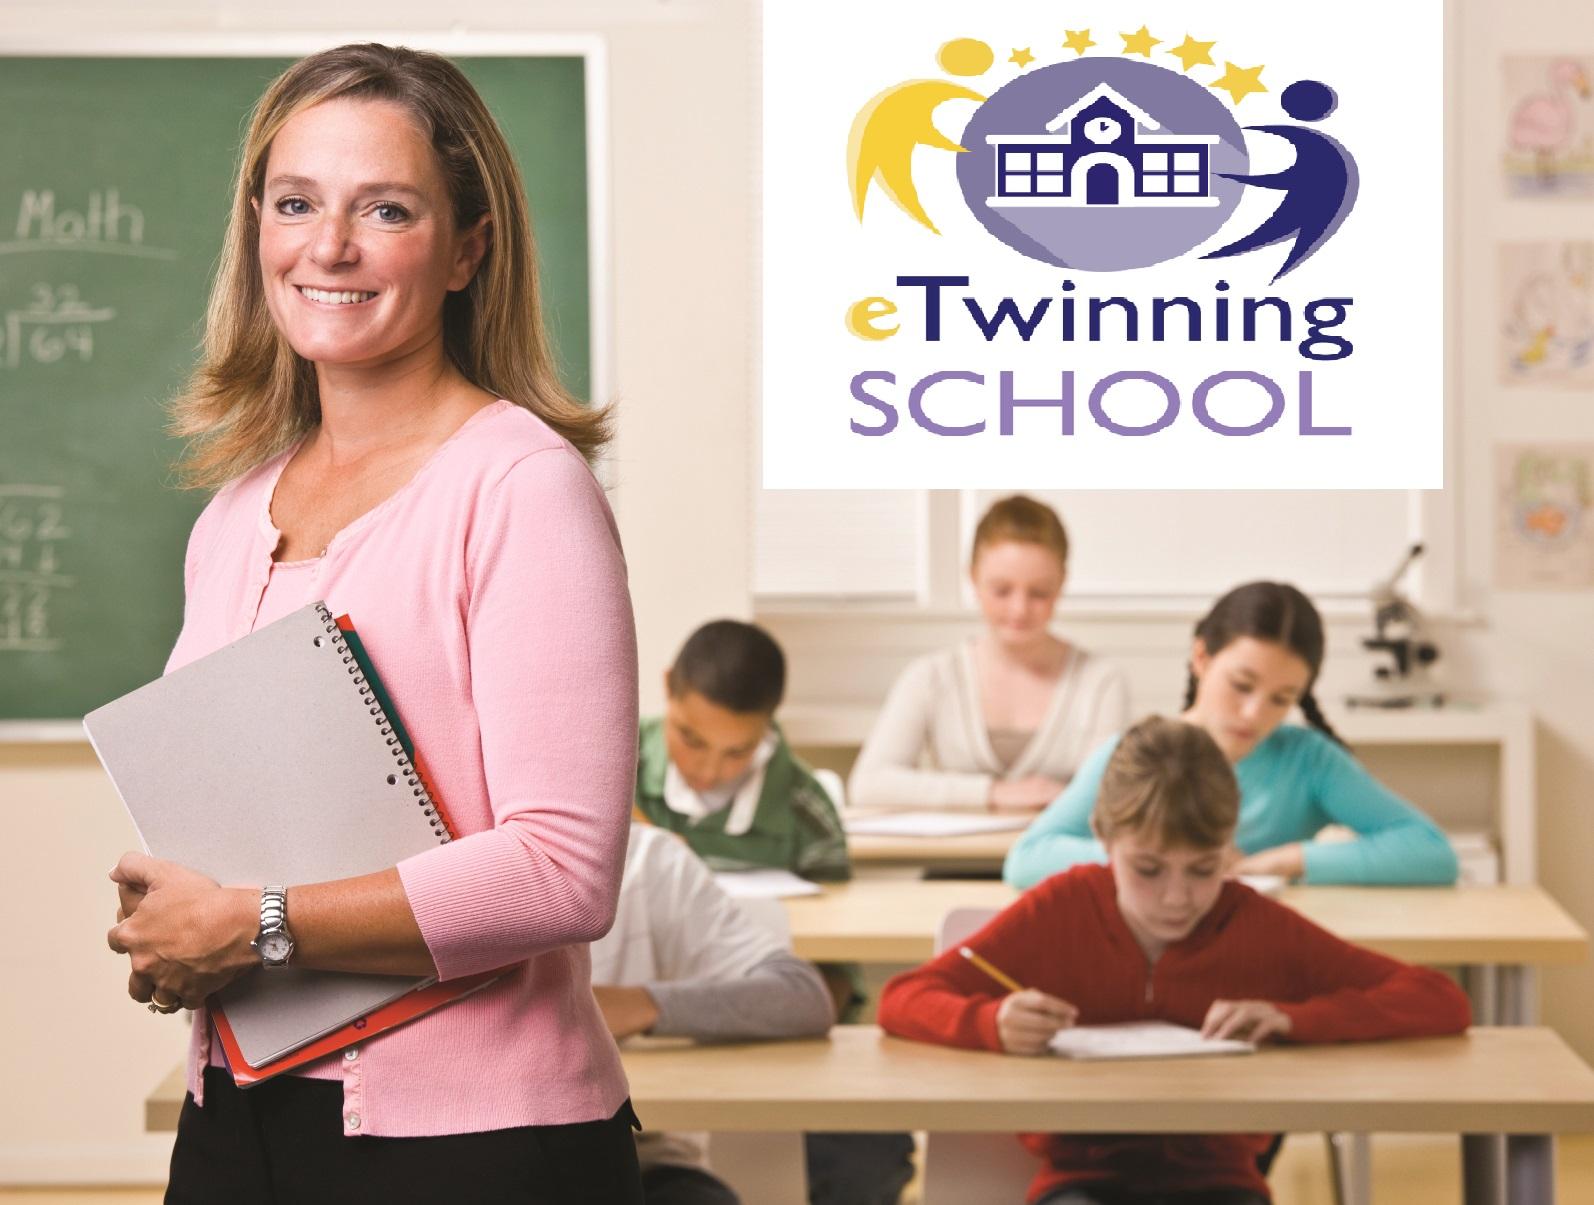 eTwinning launched eTwinning school label